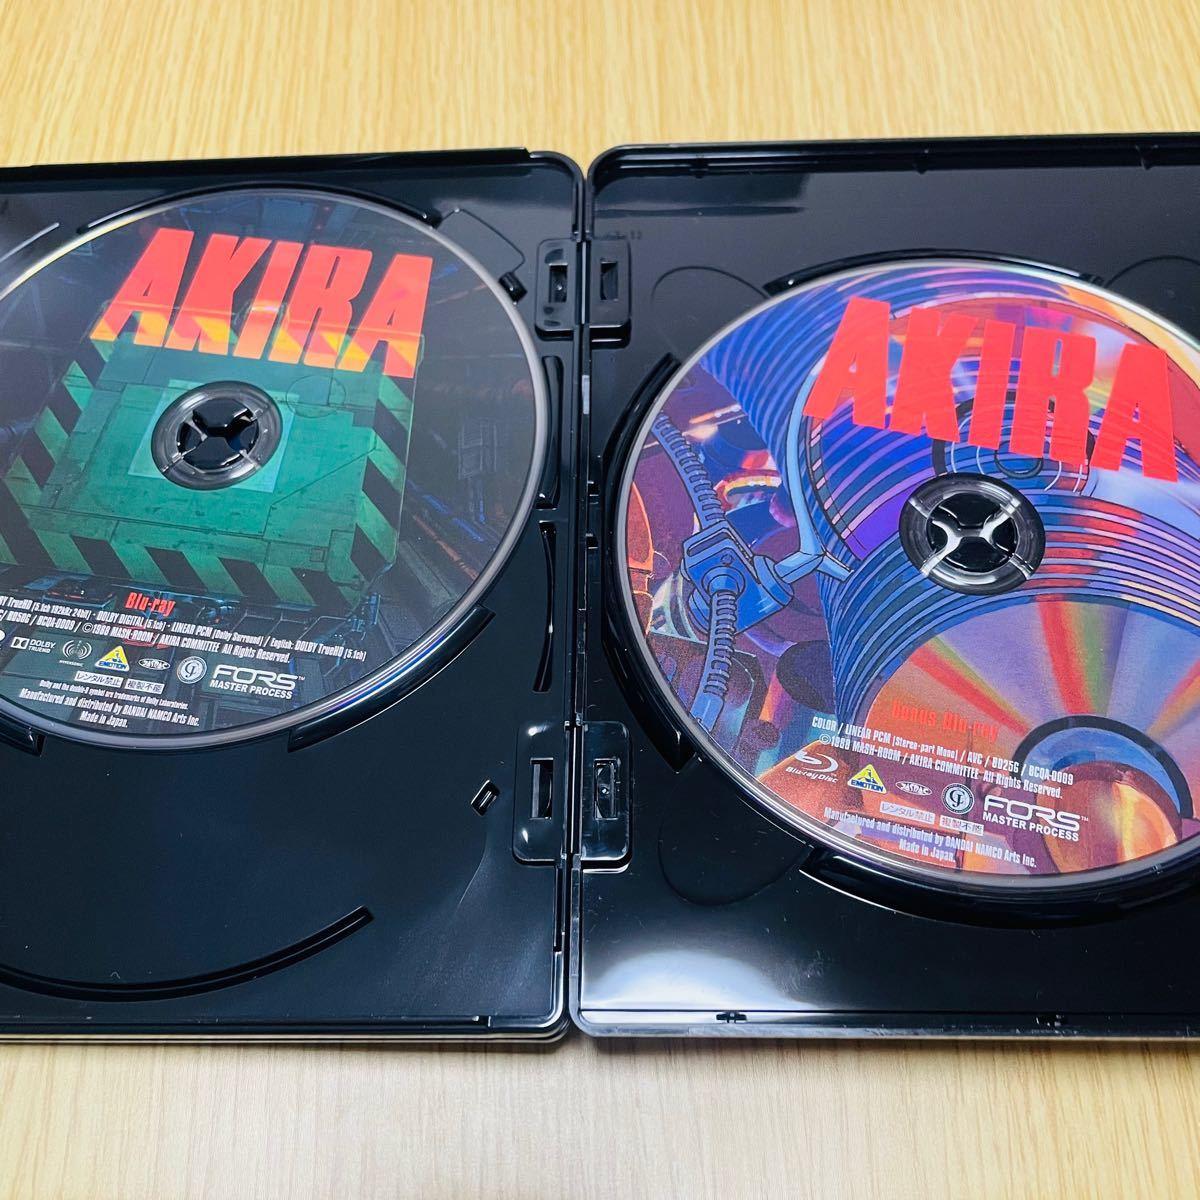 AKIRA 4K REMASTER SET ULTRA HD BIu-ray アキラ リマスター ウルトラブルーレイ 特装限定版